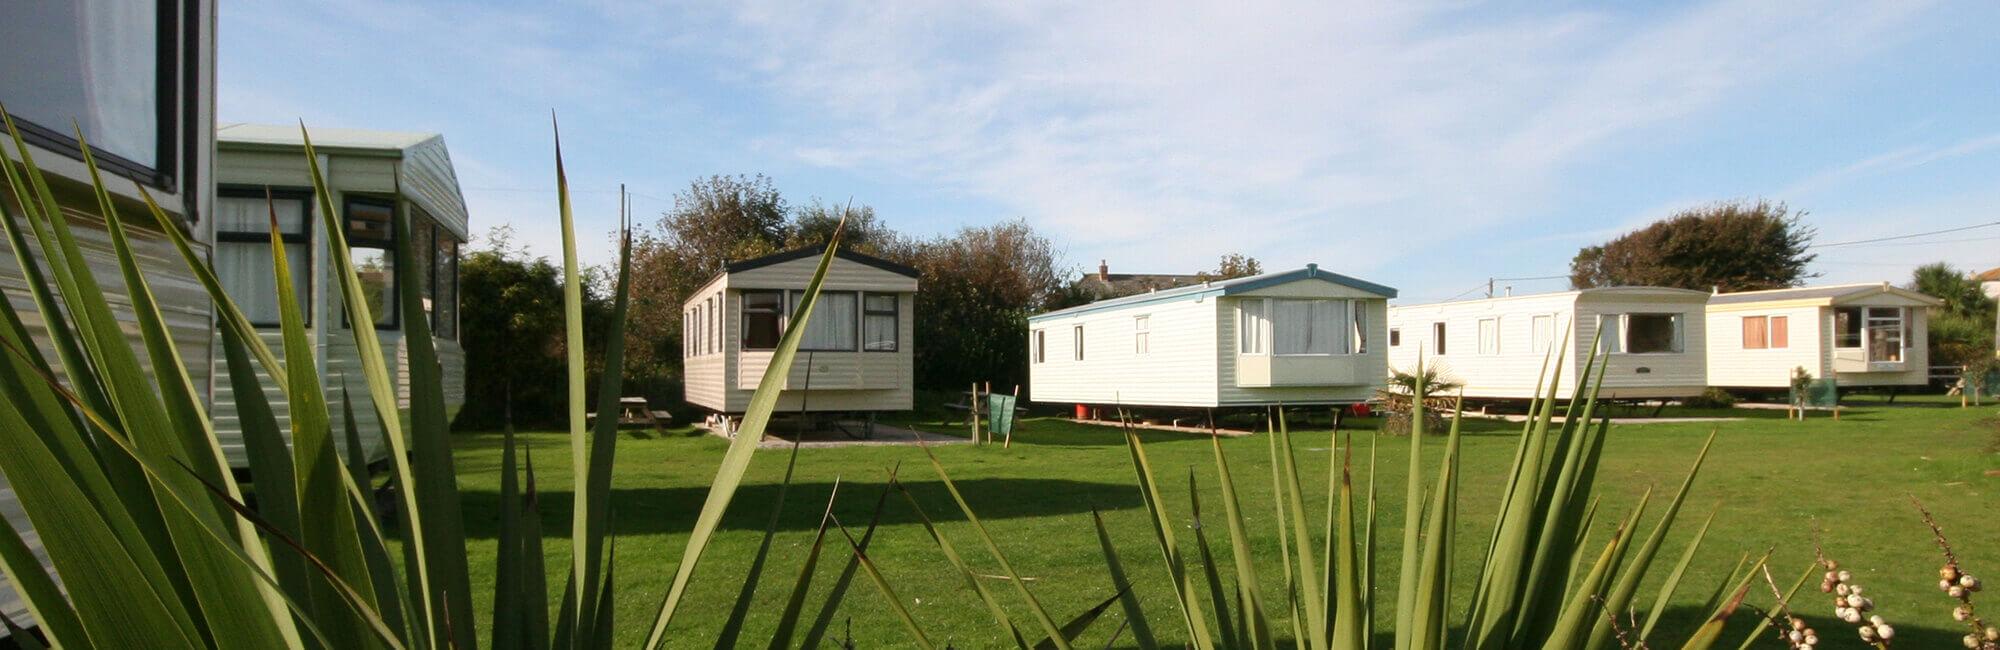 caravans Holywell Bay